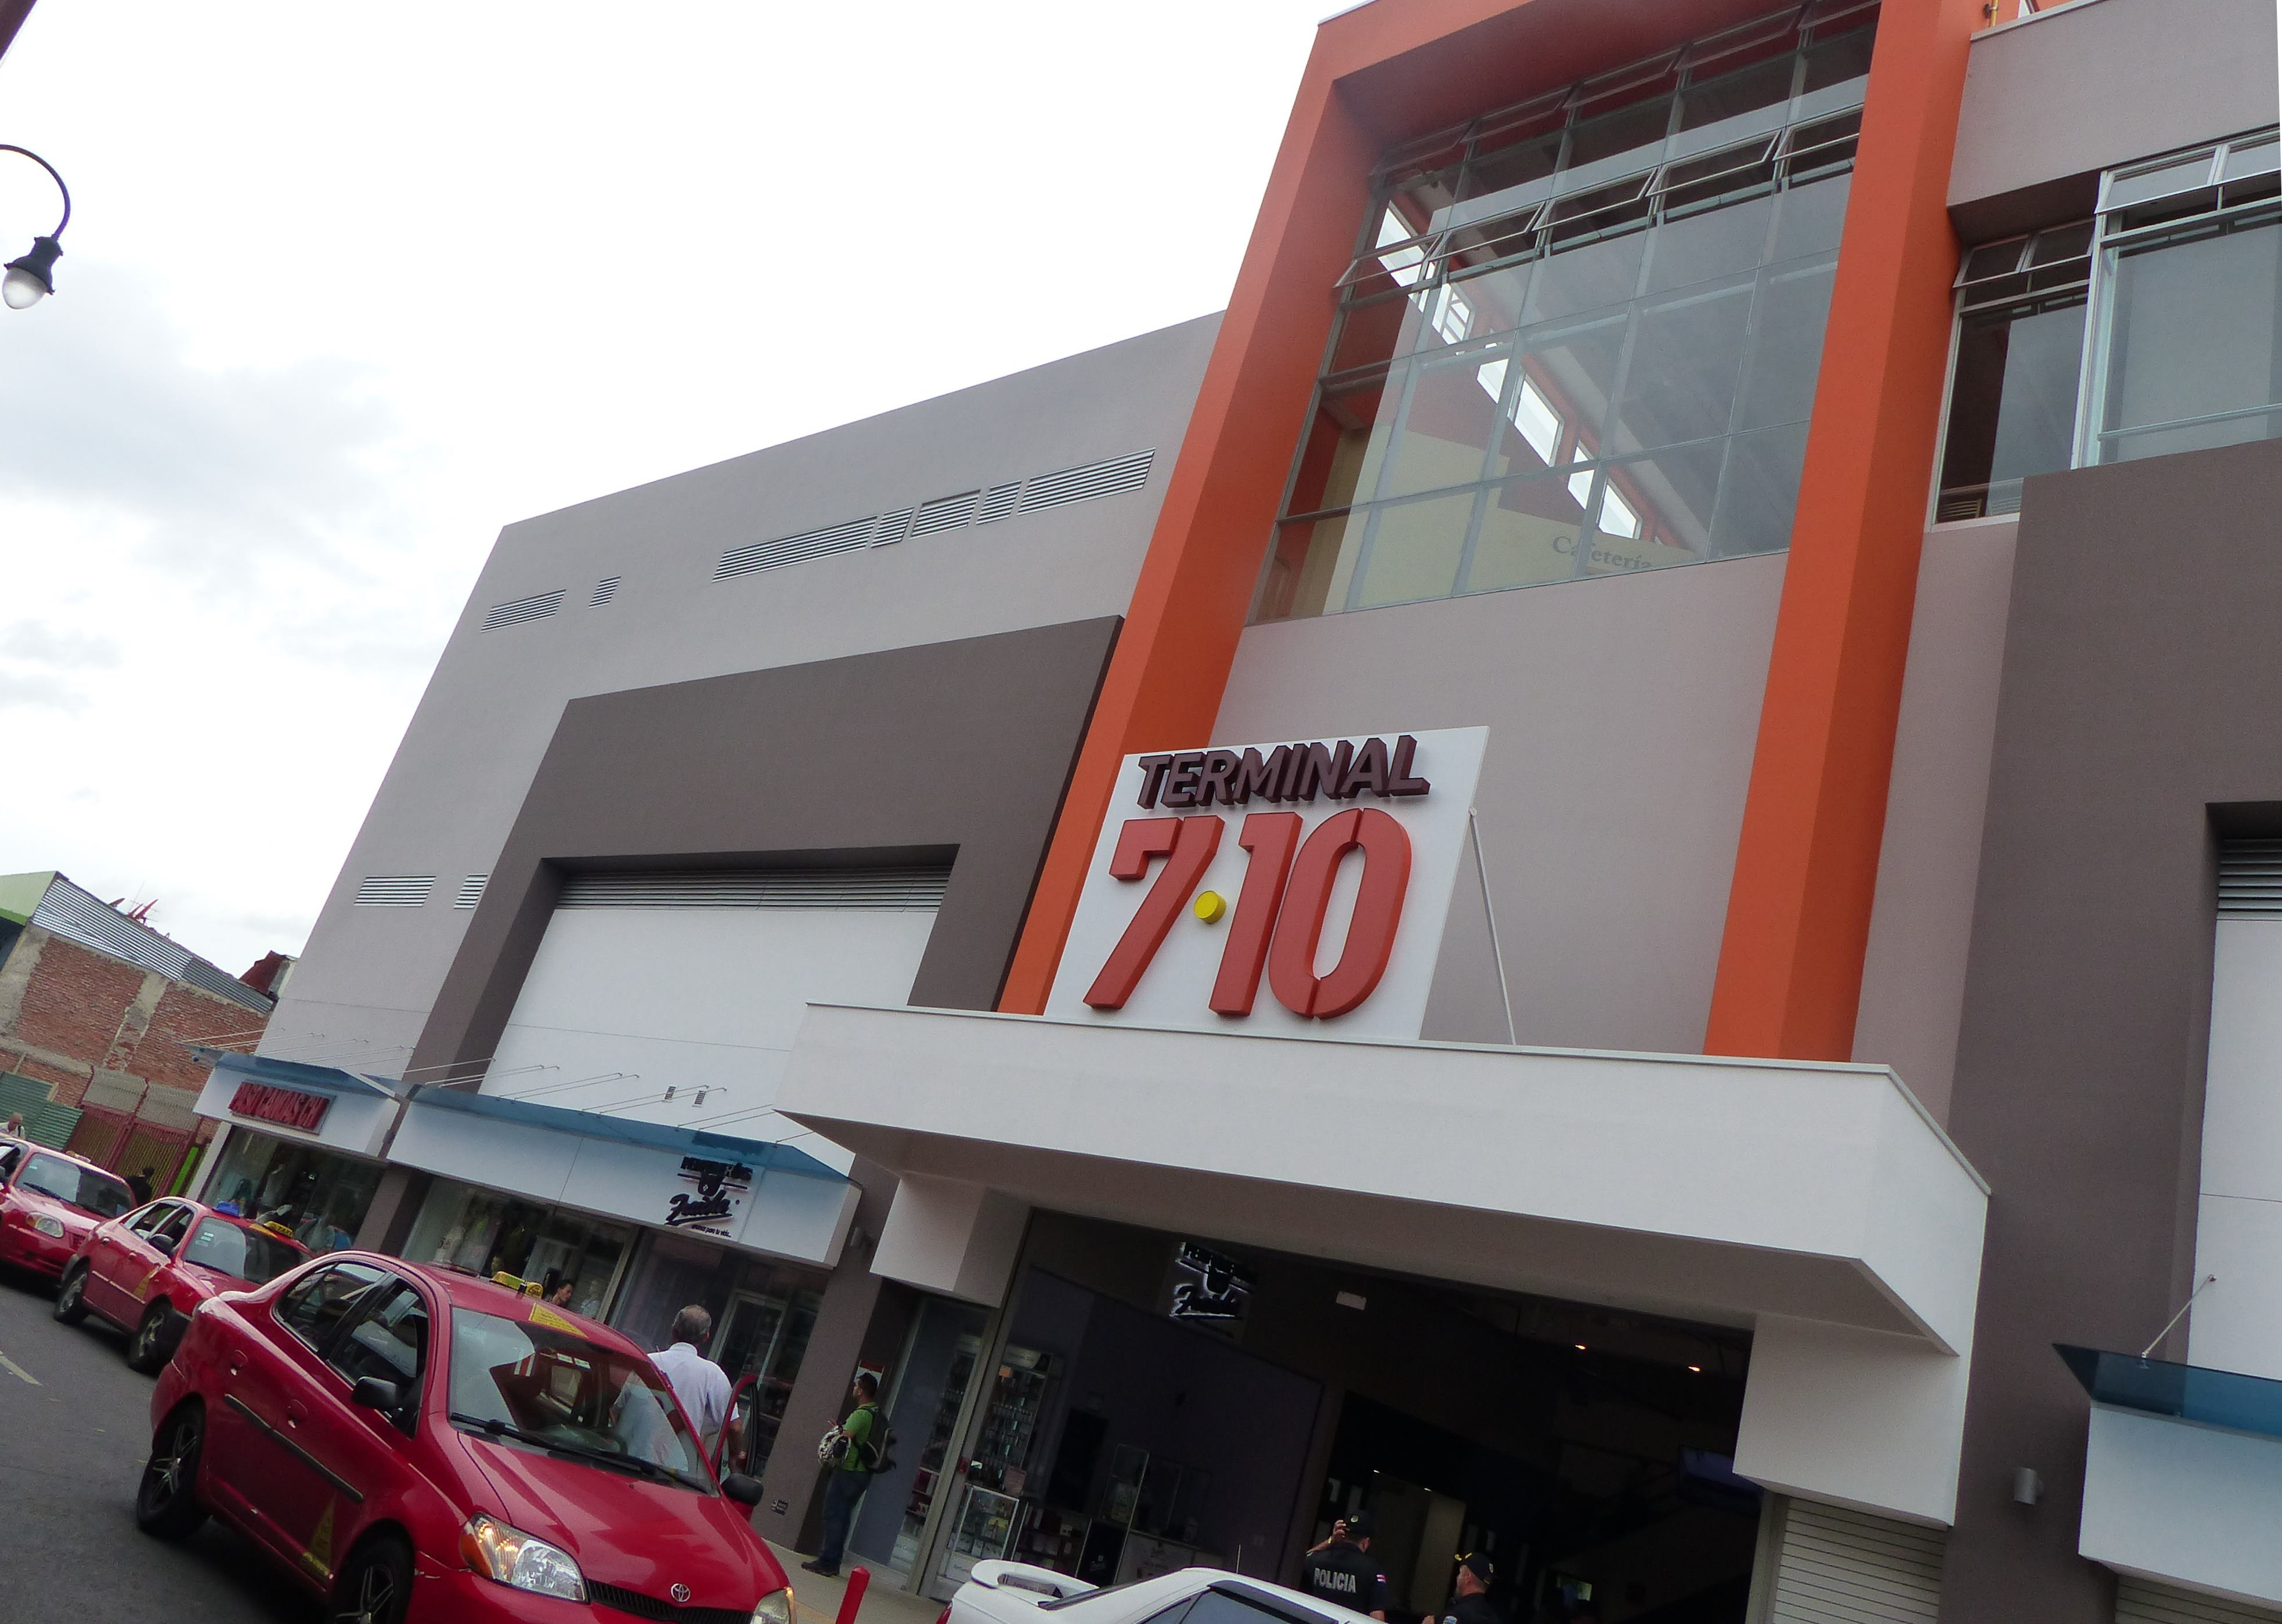 Terminal 7 10